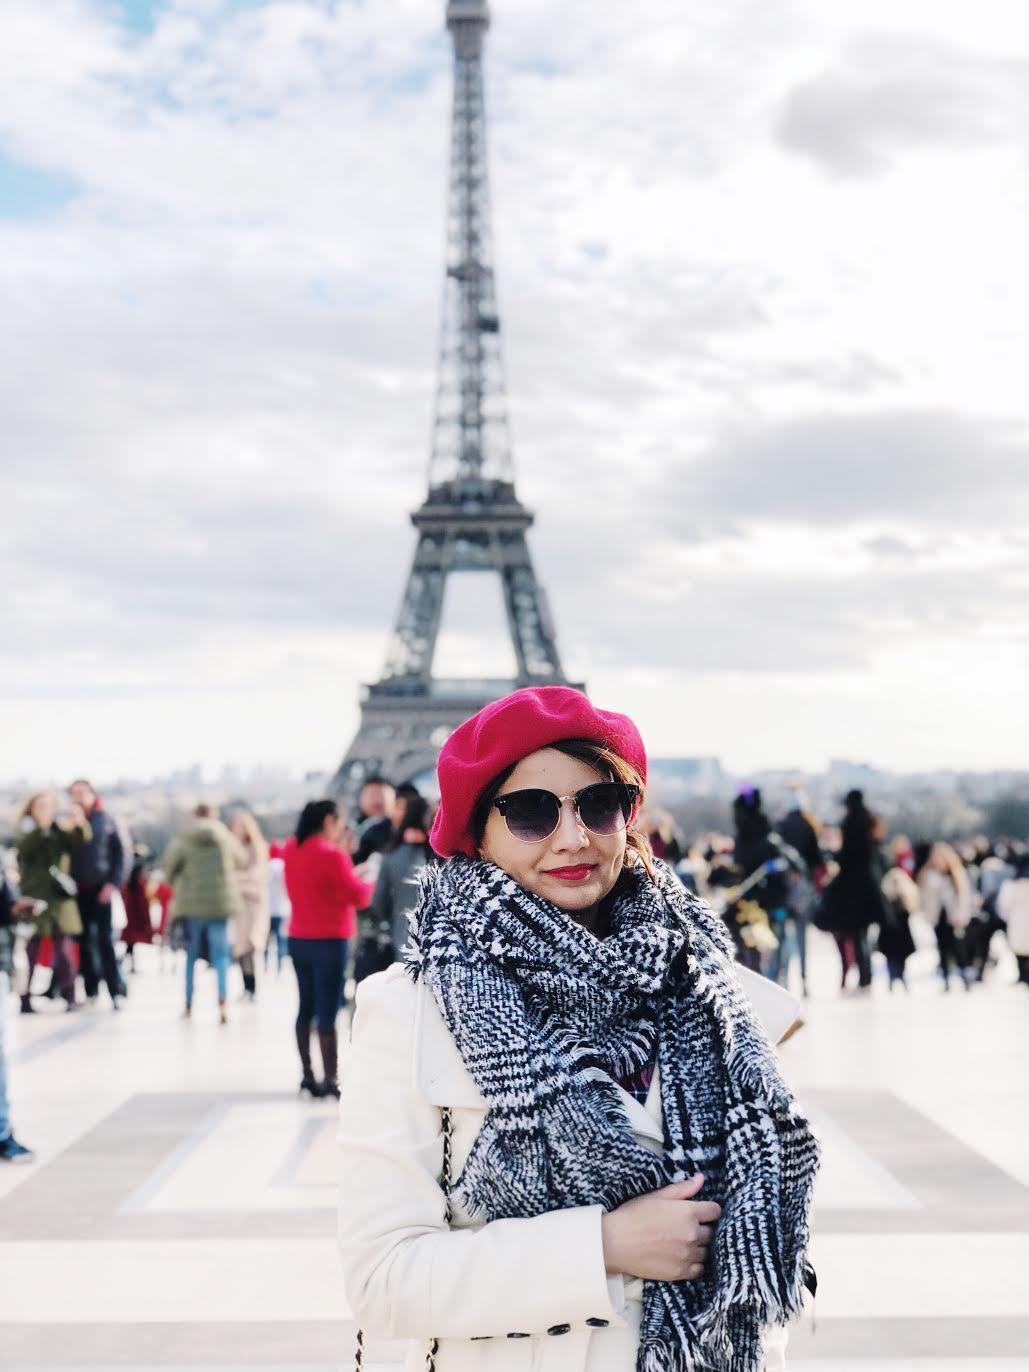 Muslim-travel-guide-Paris-Eiffel-Tower-portrait-location.jpg